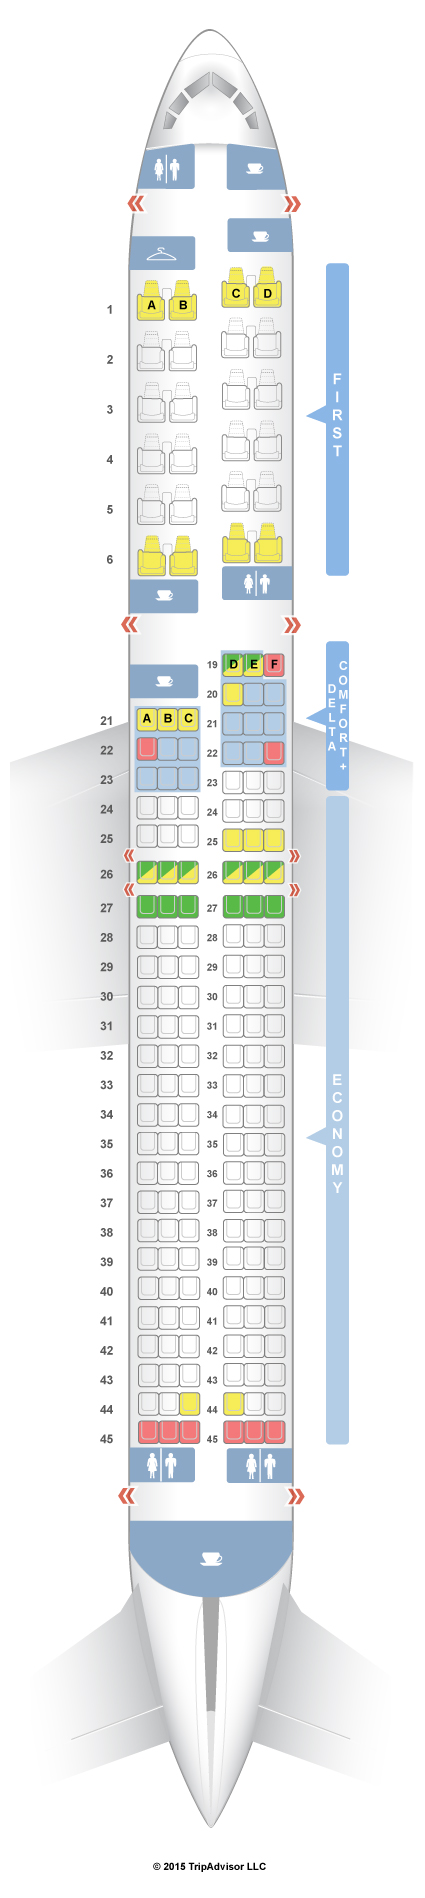 Delta seat assignment